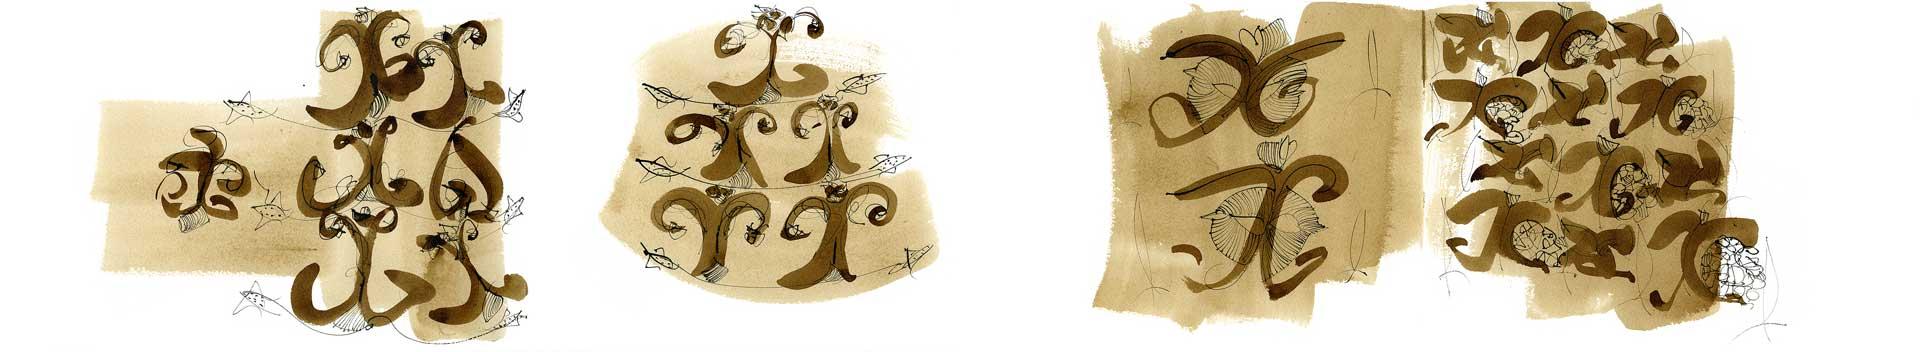 Dessin de Catherine Vanier issu du livre d'artiste 2012